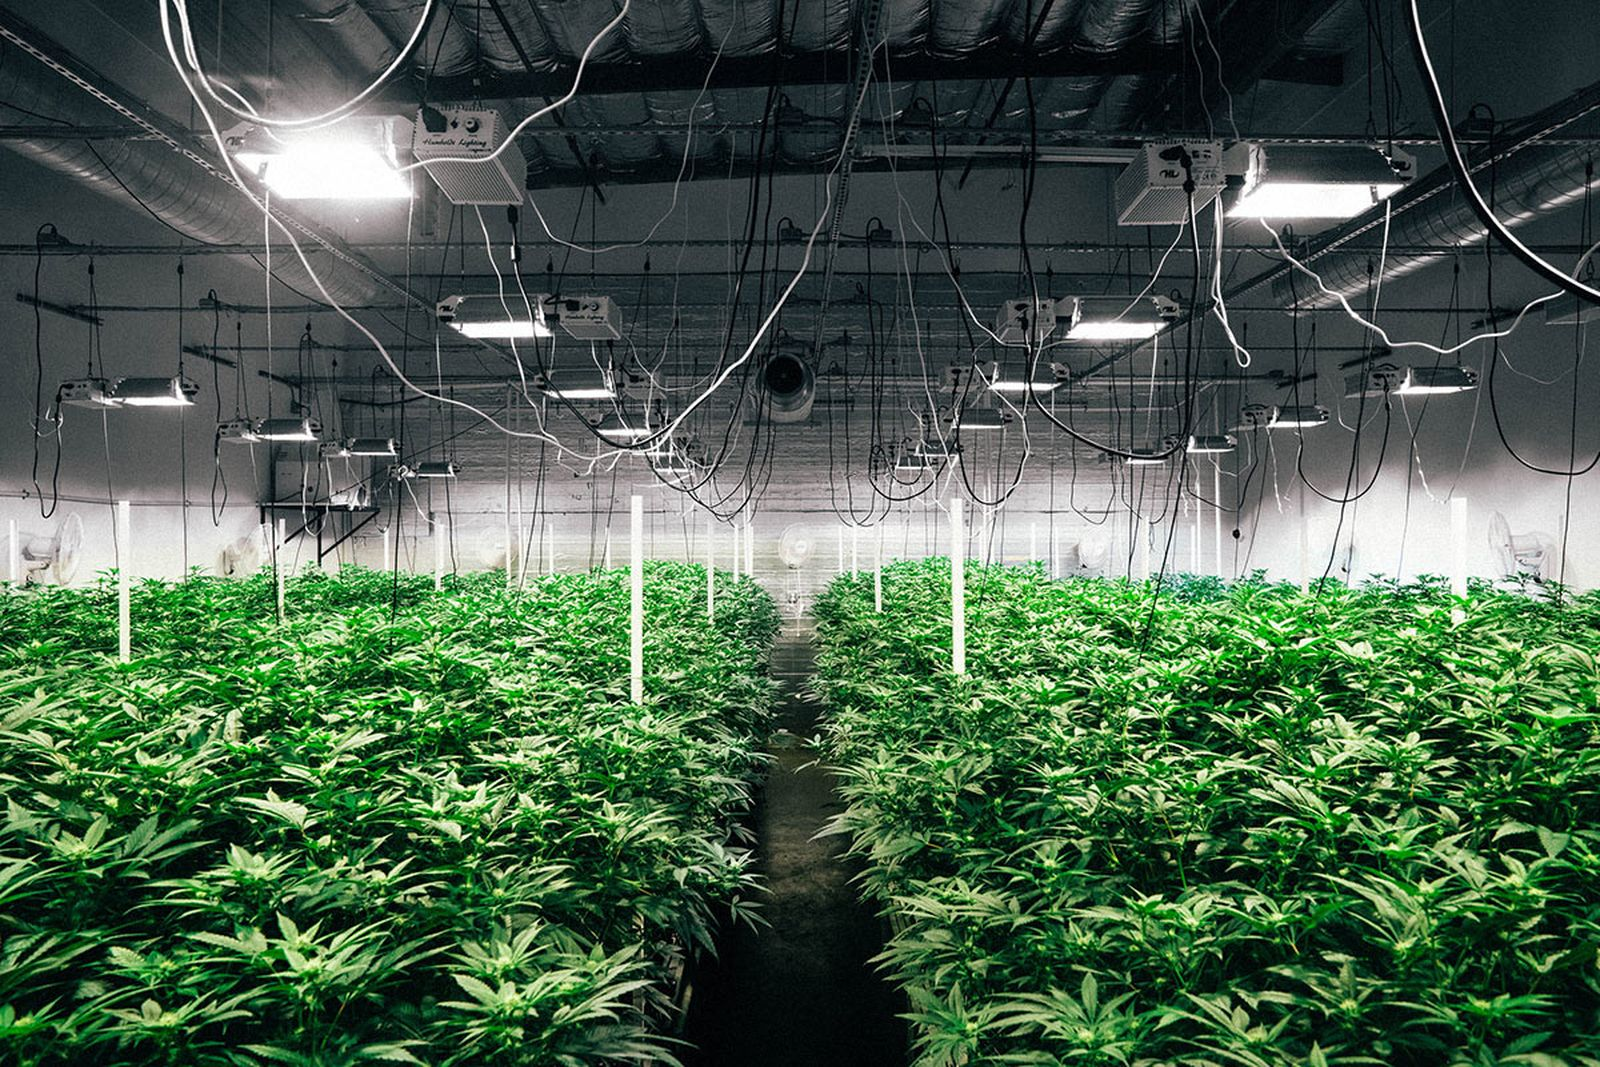 counterfeit cannabis need know billion dollar market MedMen Sherbinskis marijuana